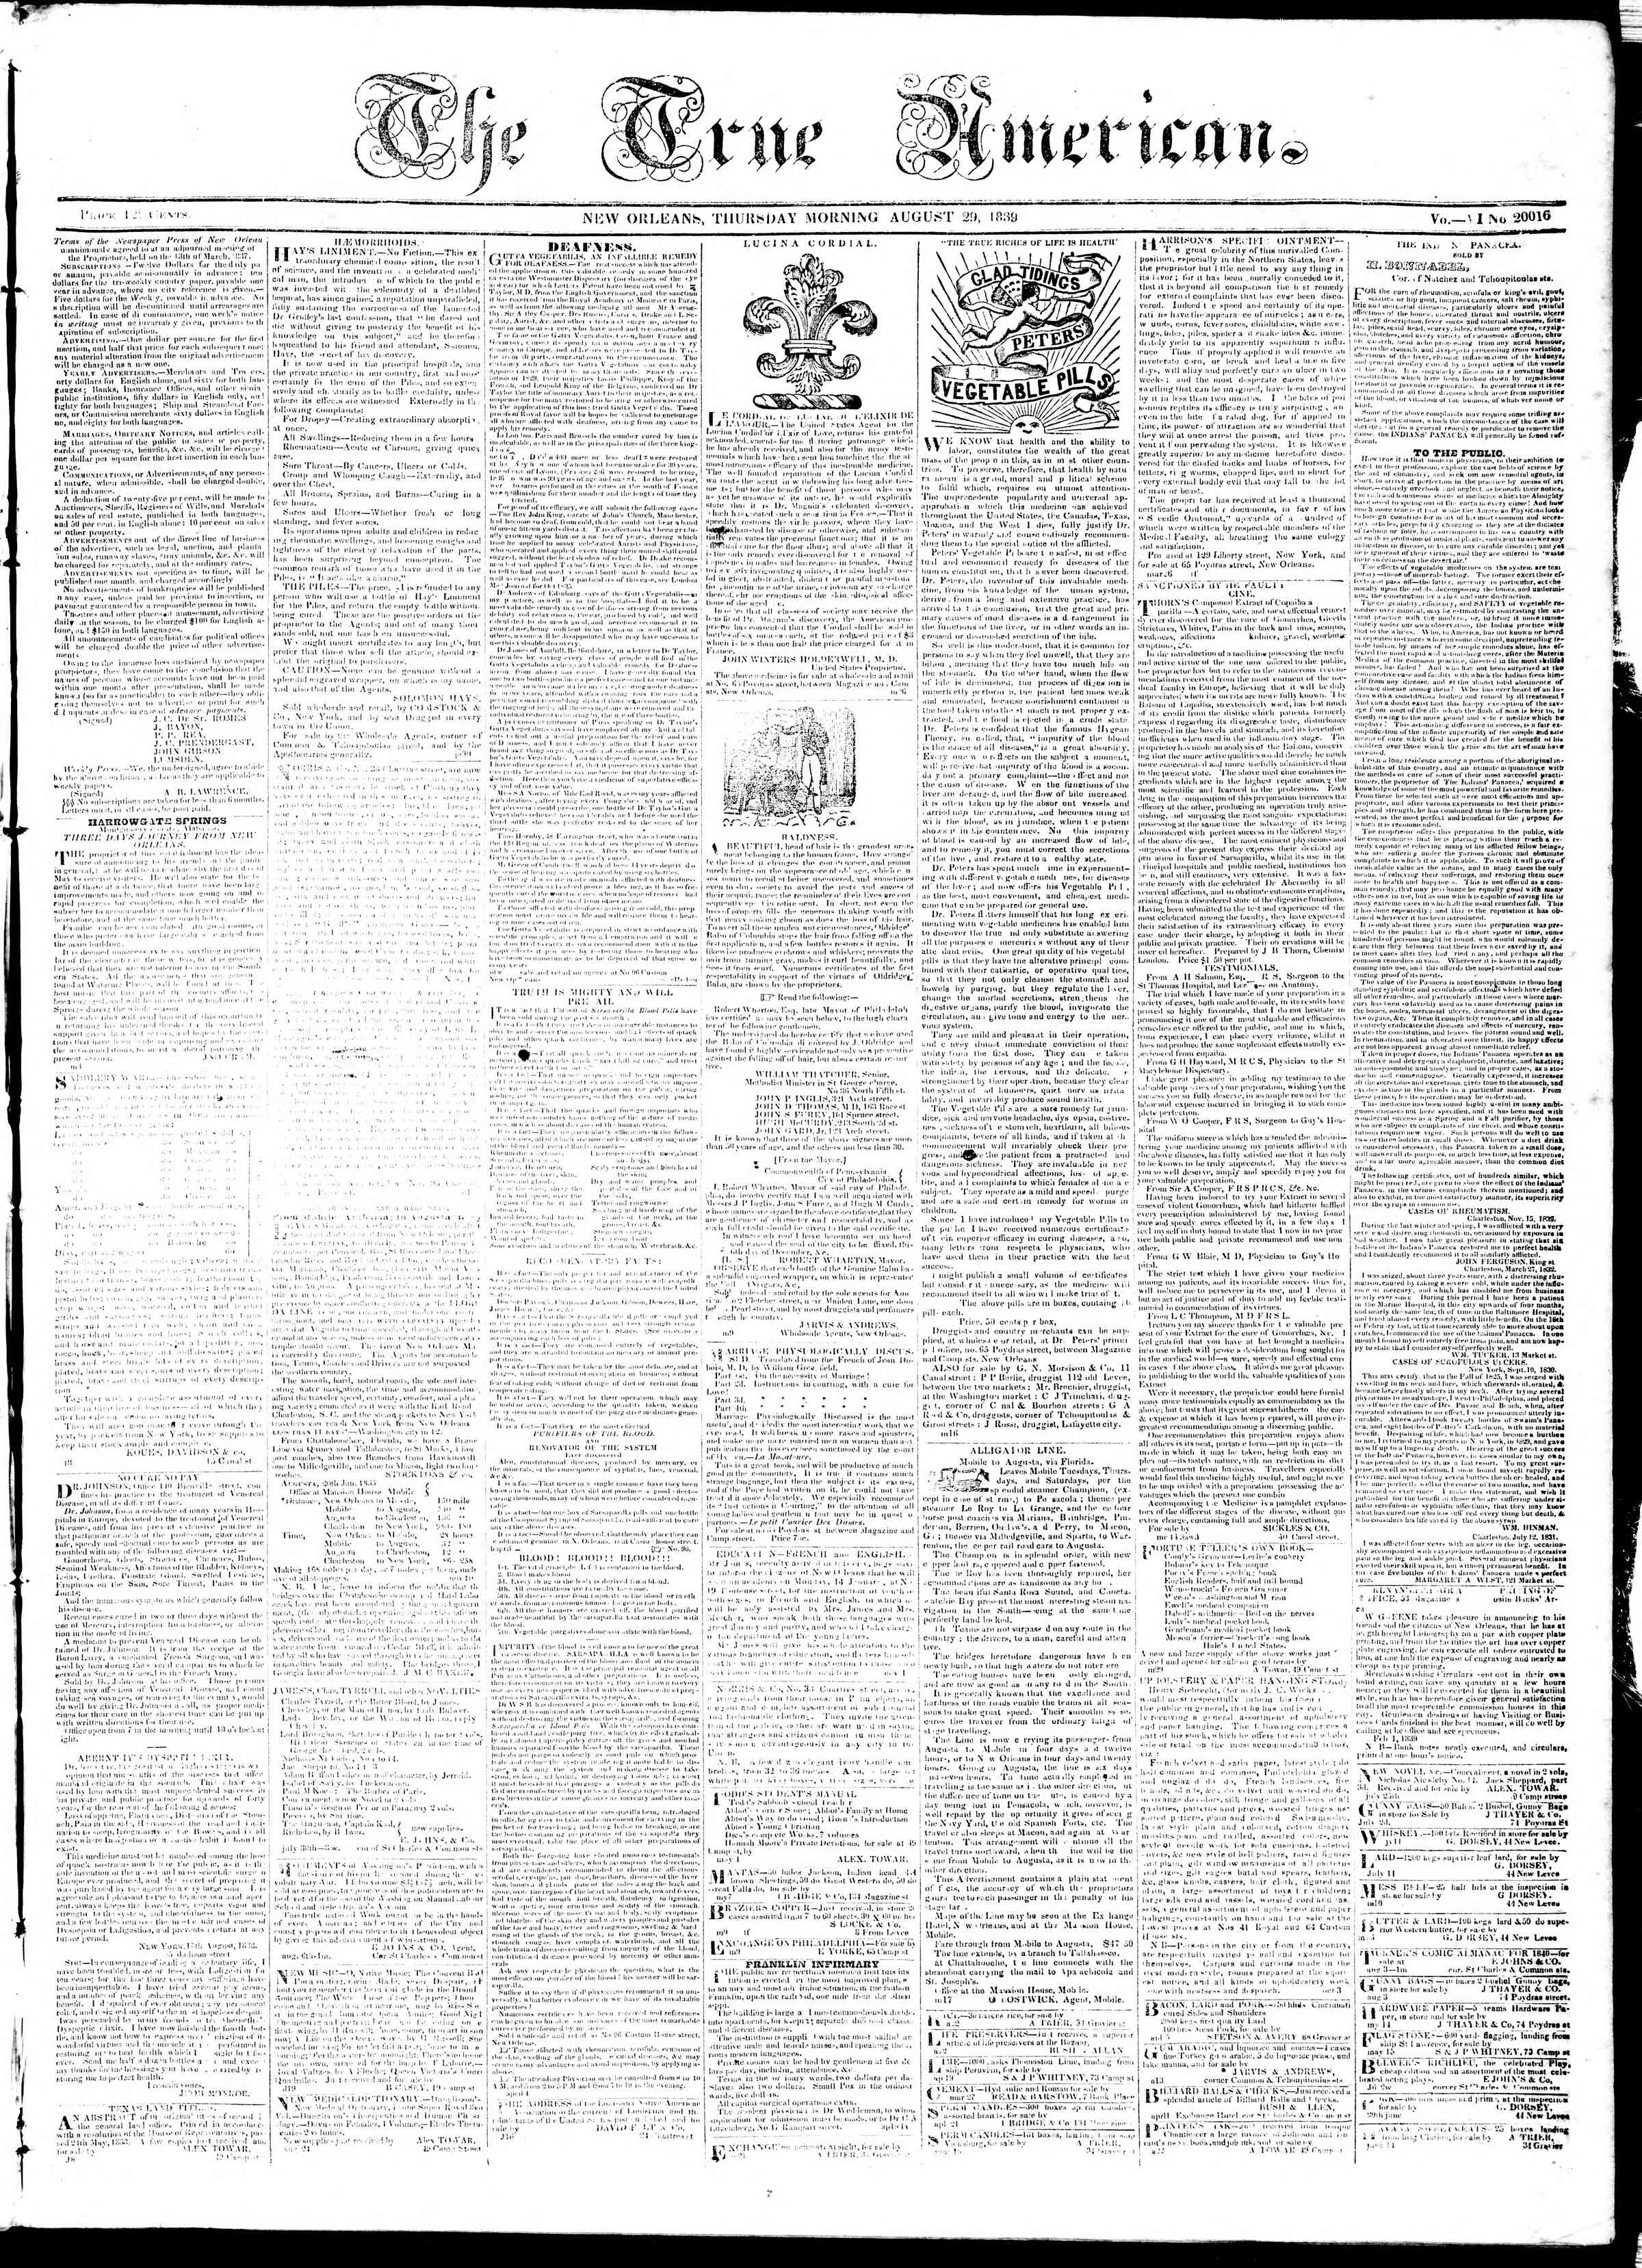 August 29, 1839 Tarihli True American Gazetesi Sayfa 1